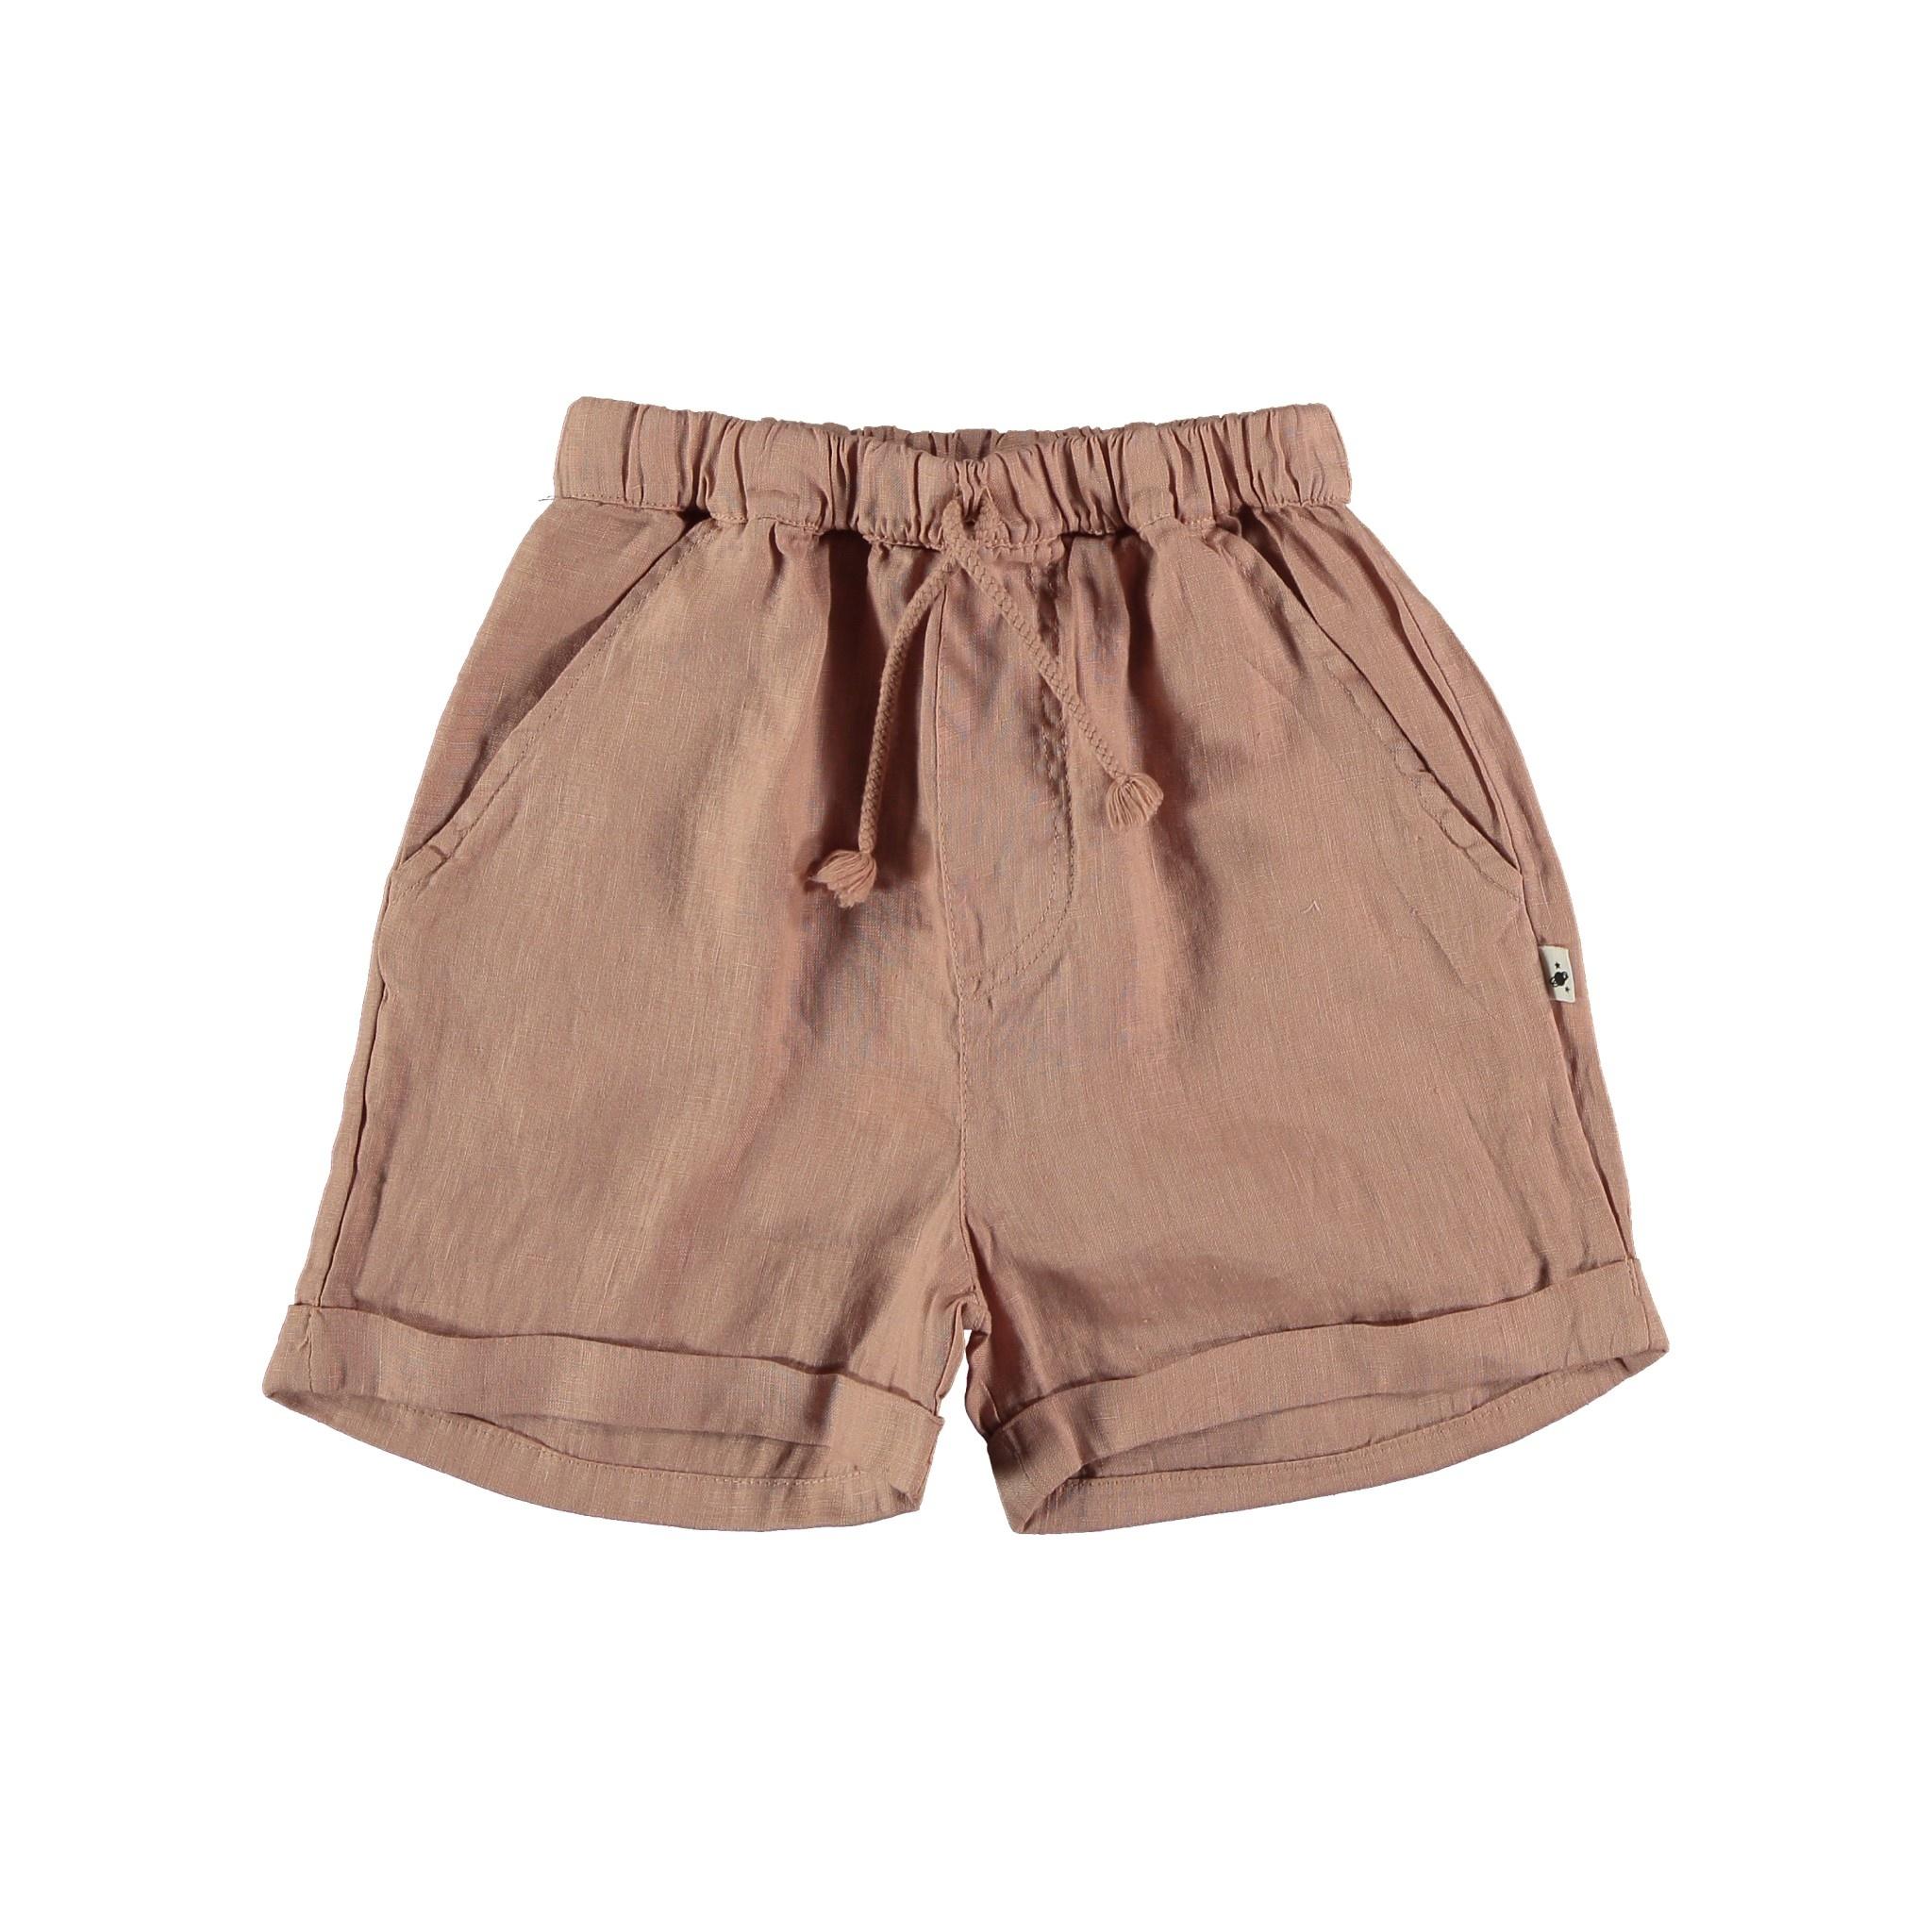 My Little Cozmo Linen & cotton bermuda shorts | Terra cotton